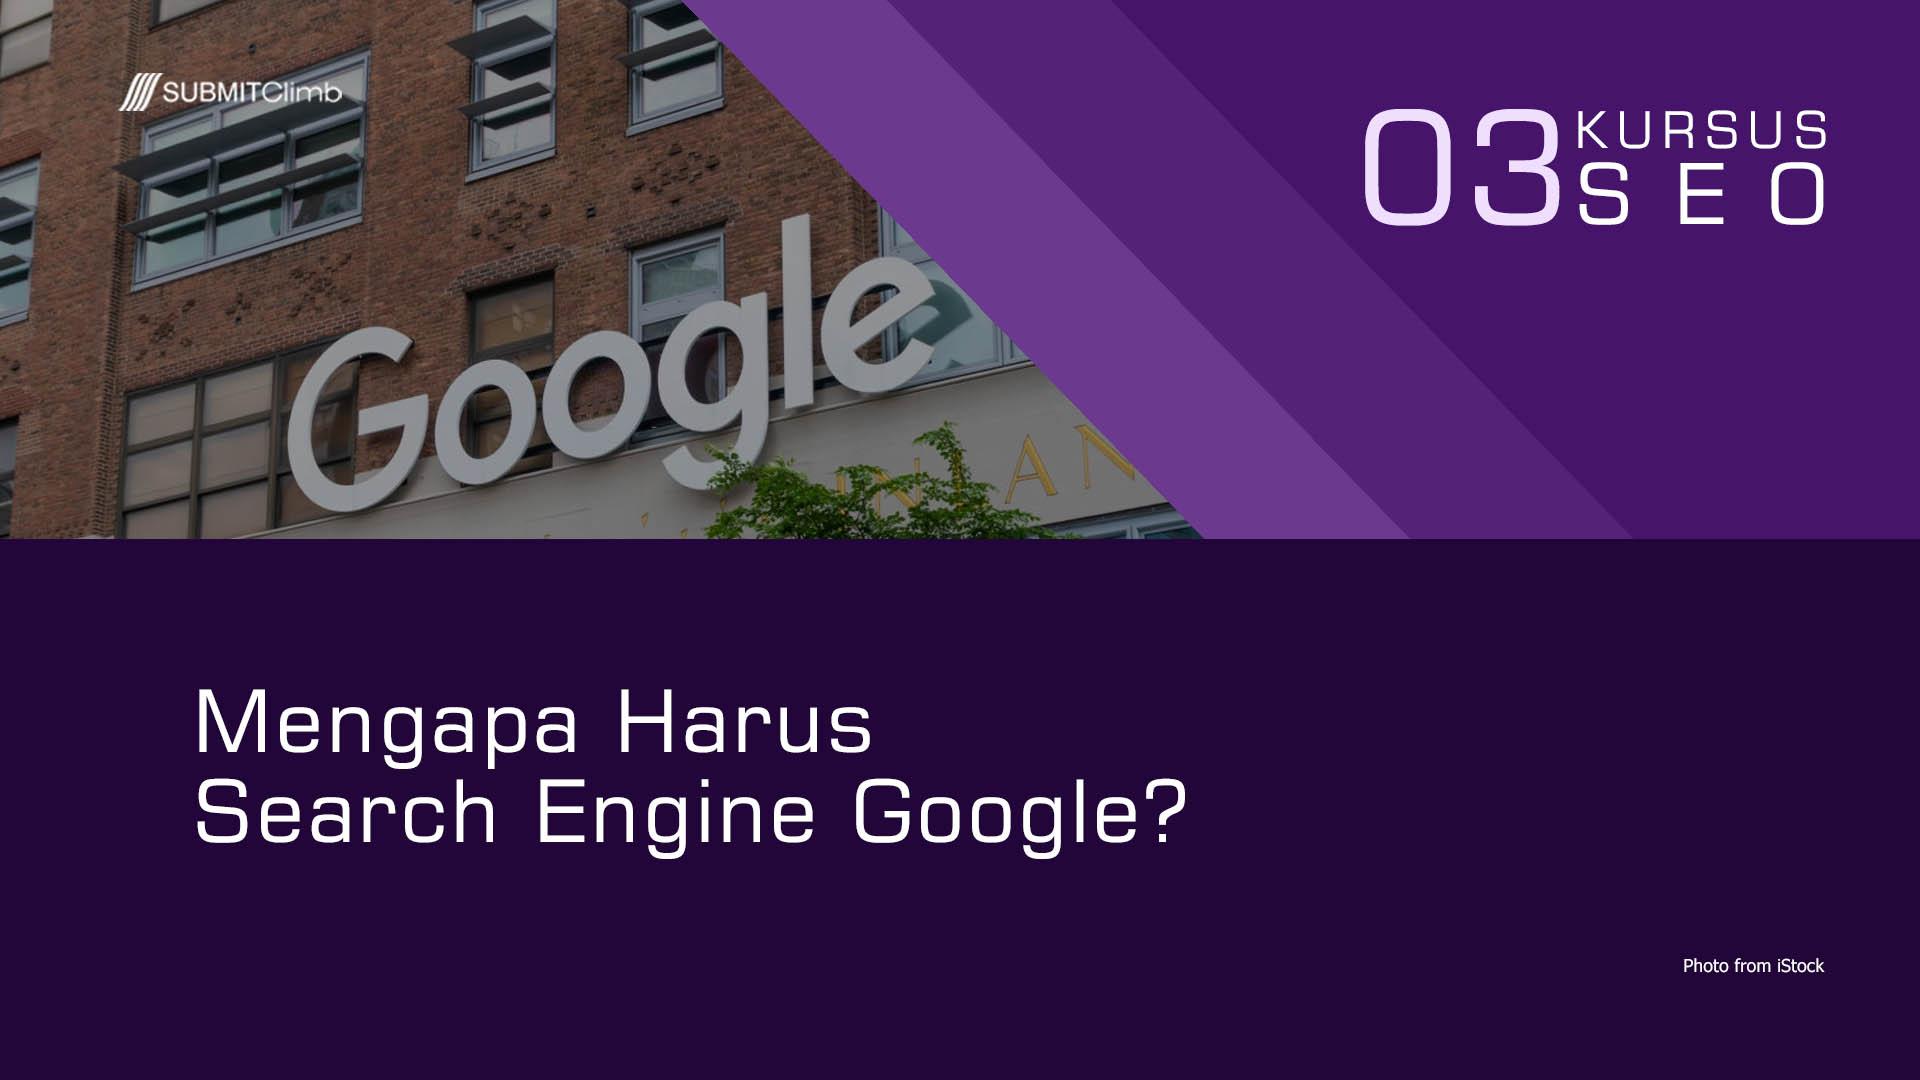 Mengapa Harus Search Engine Google